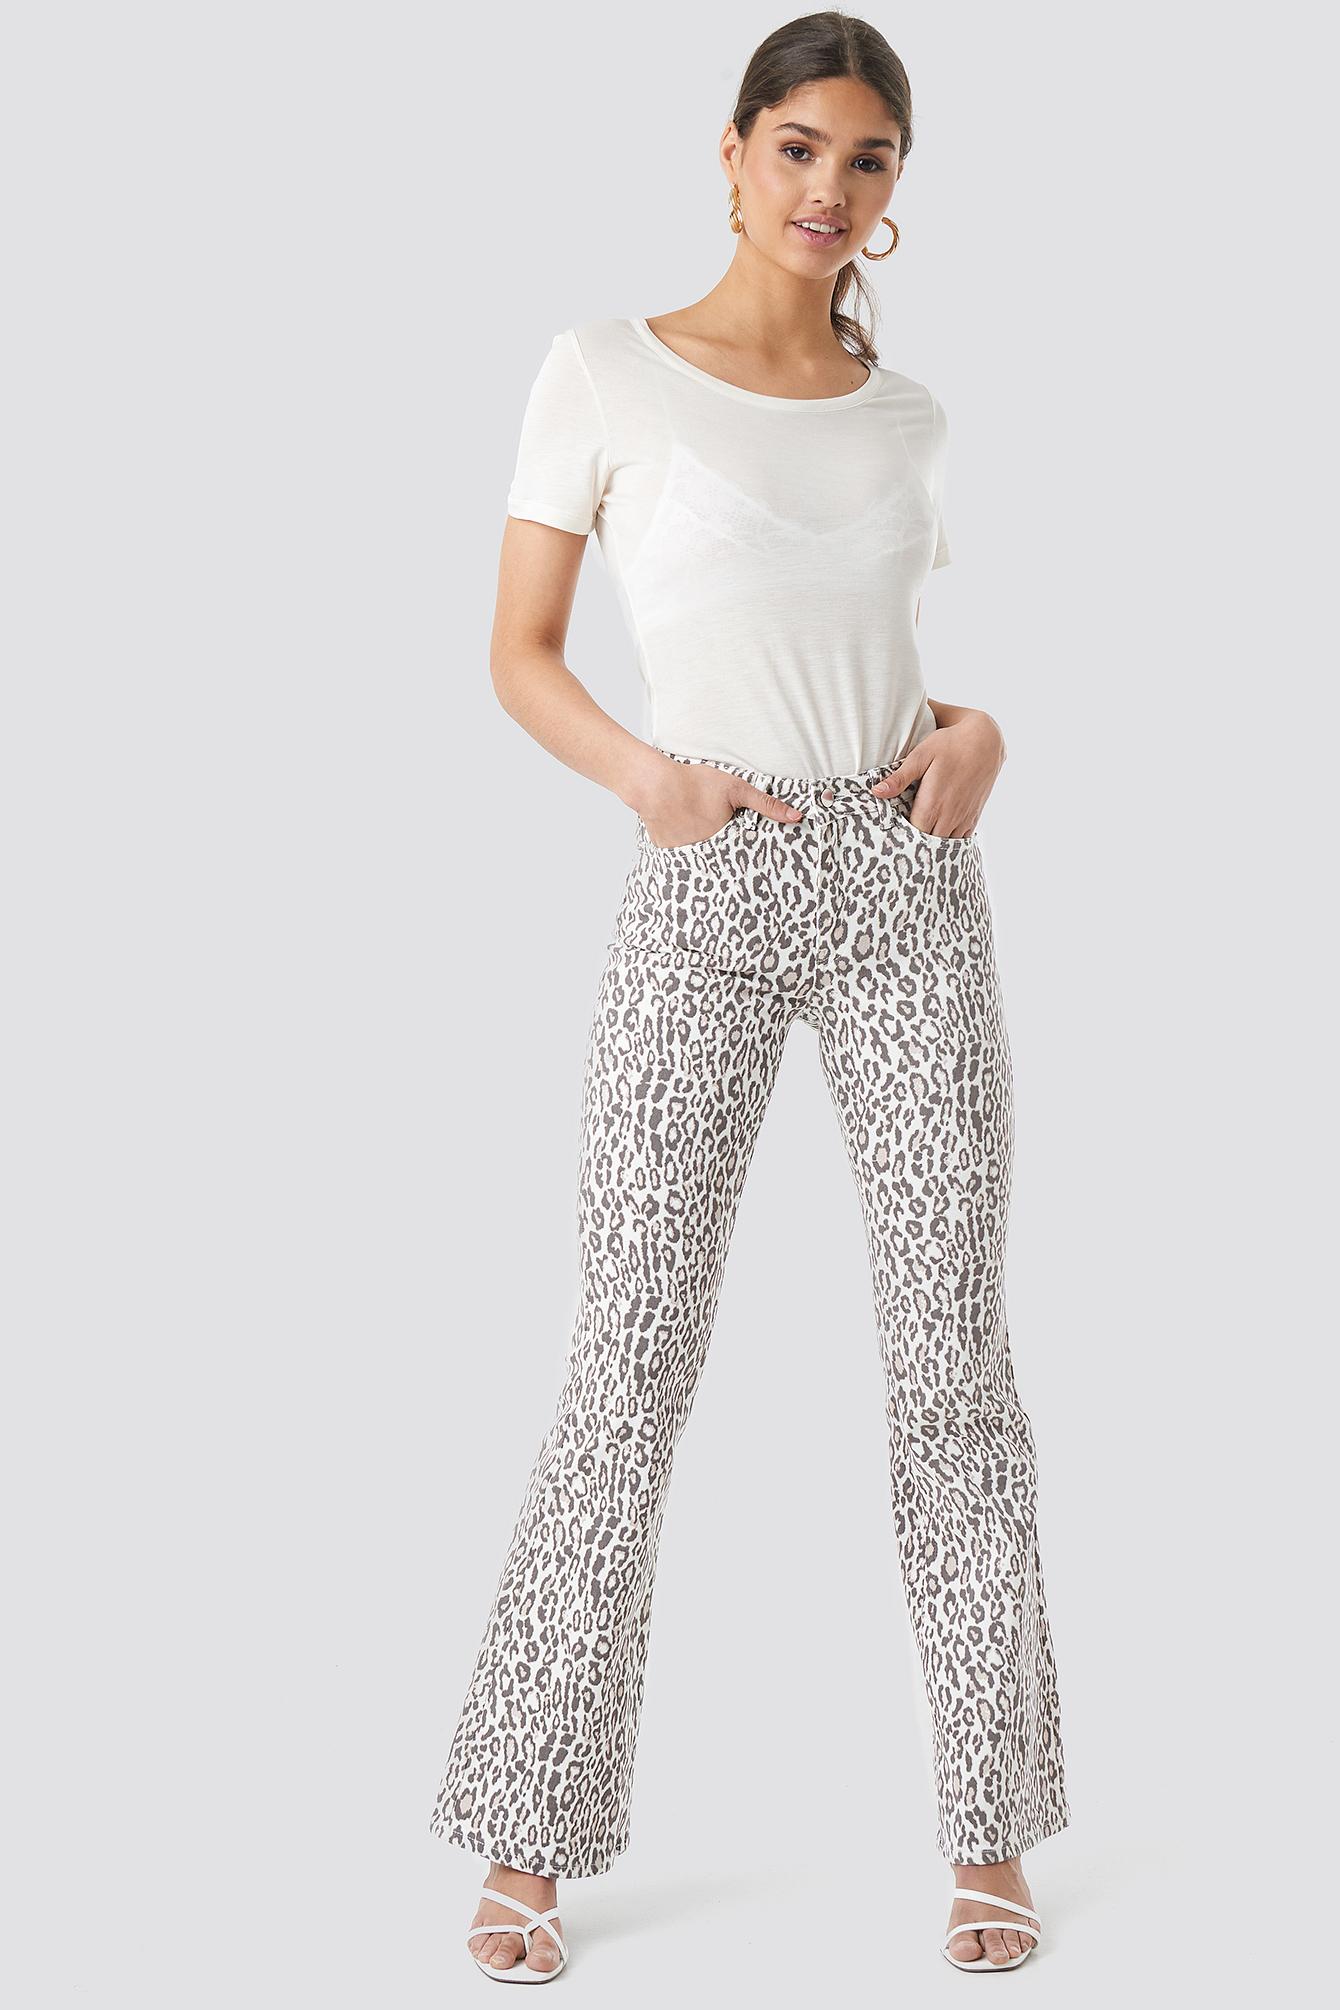 kae sutherland x na-kd -  Leopard Flared Denim - Multicolor